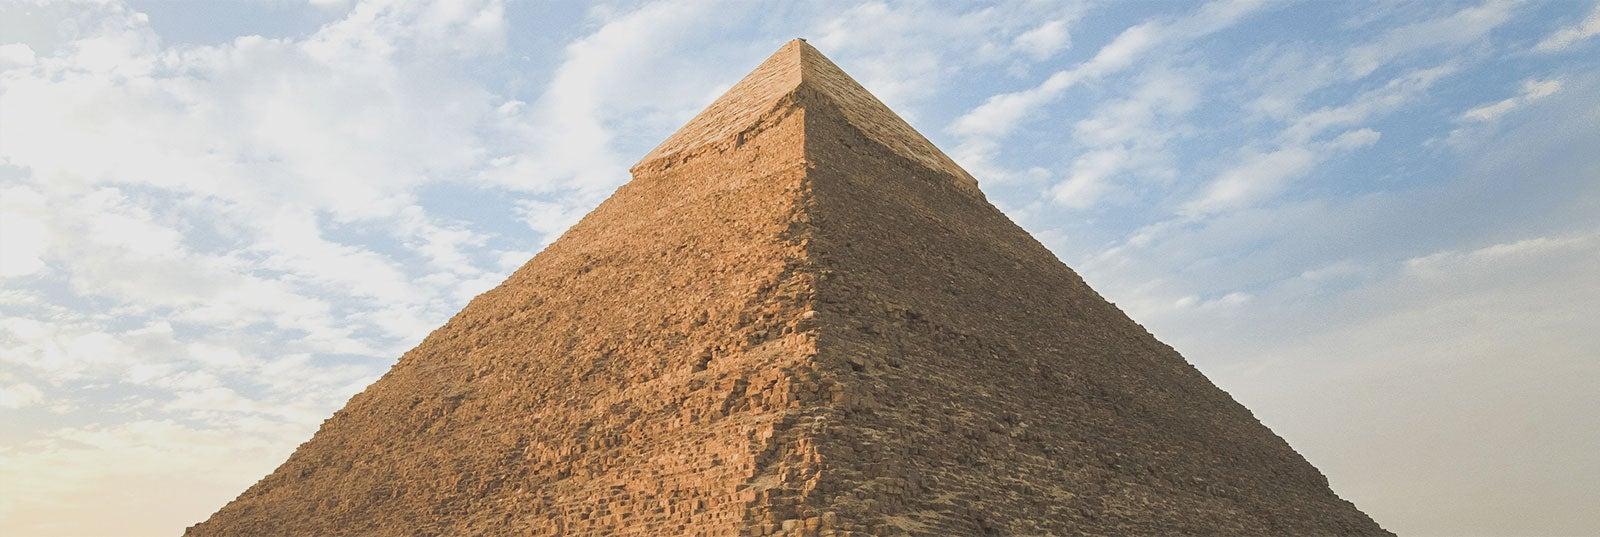 Guía turística de Egito